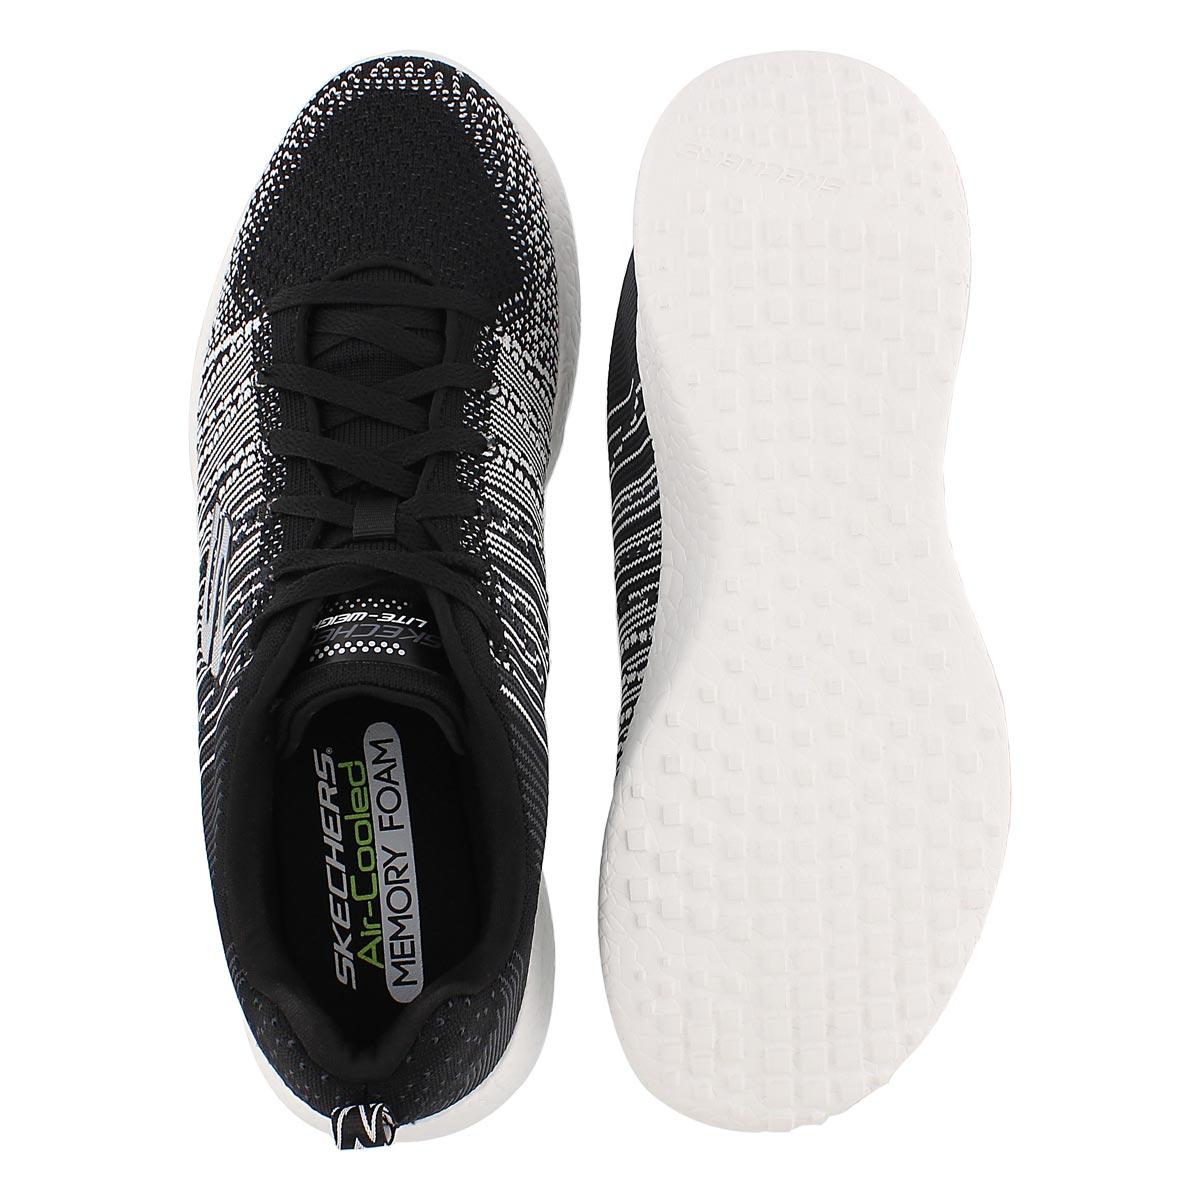 Mns Burst-In The Mix blk running shoe